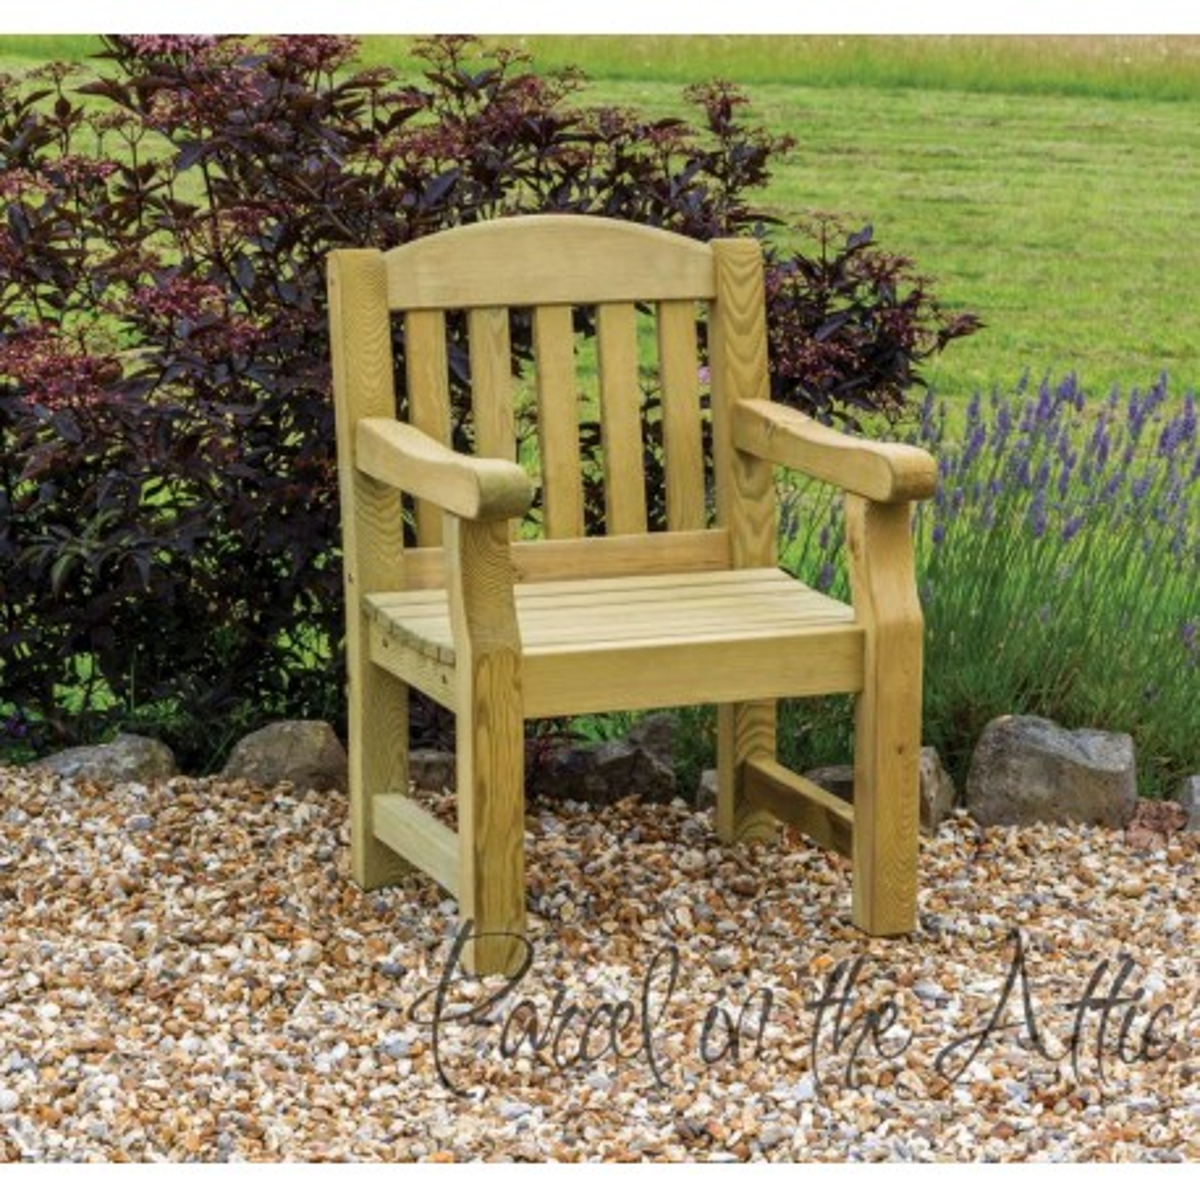 Elda Individual chair heavy duty garden bench